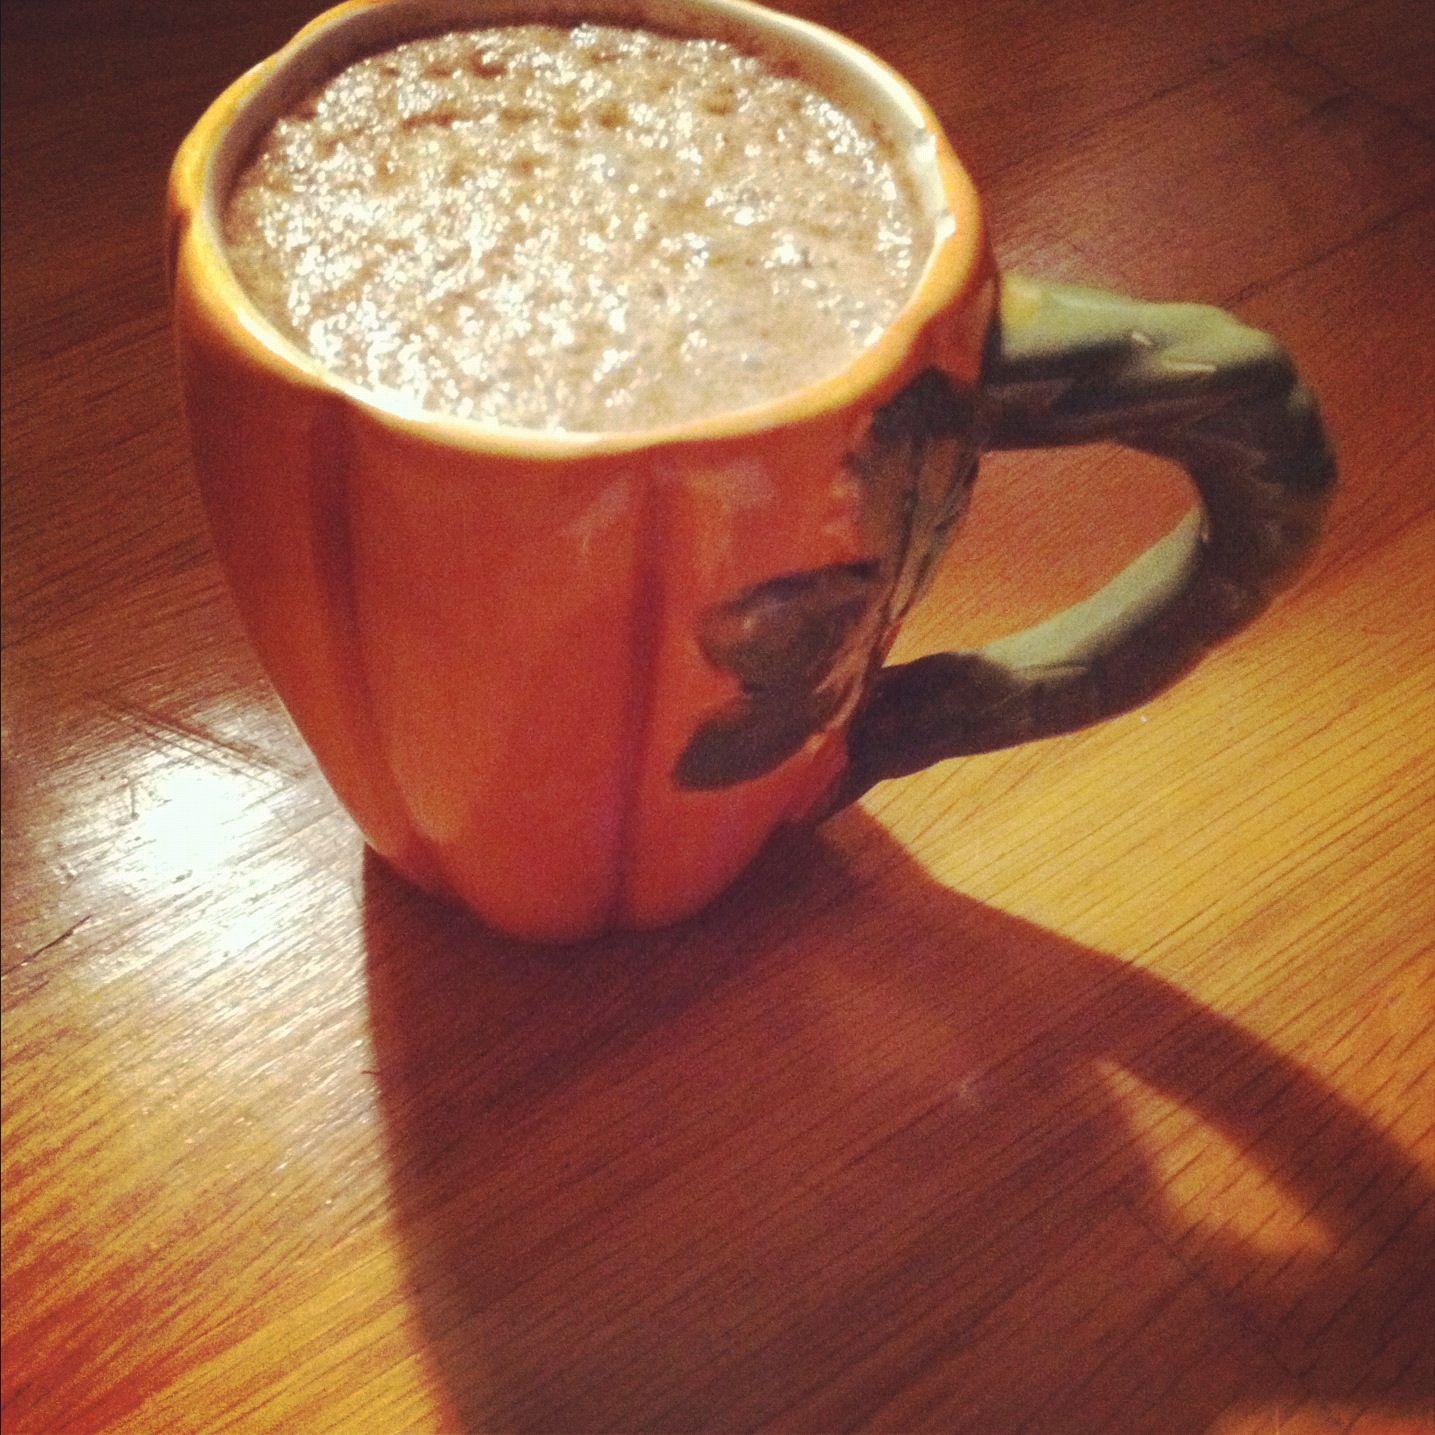 Pumpkin Spice Latte Pumpkin Milk 1 C Milk (soy) 1/4 C